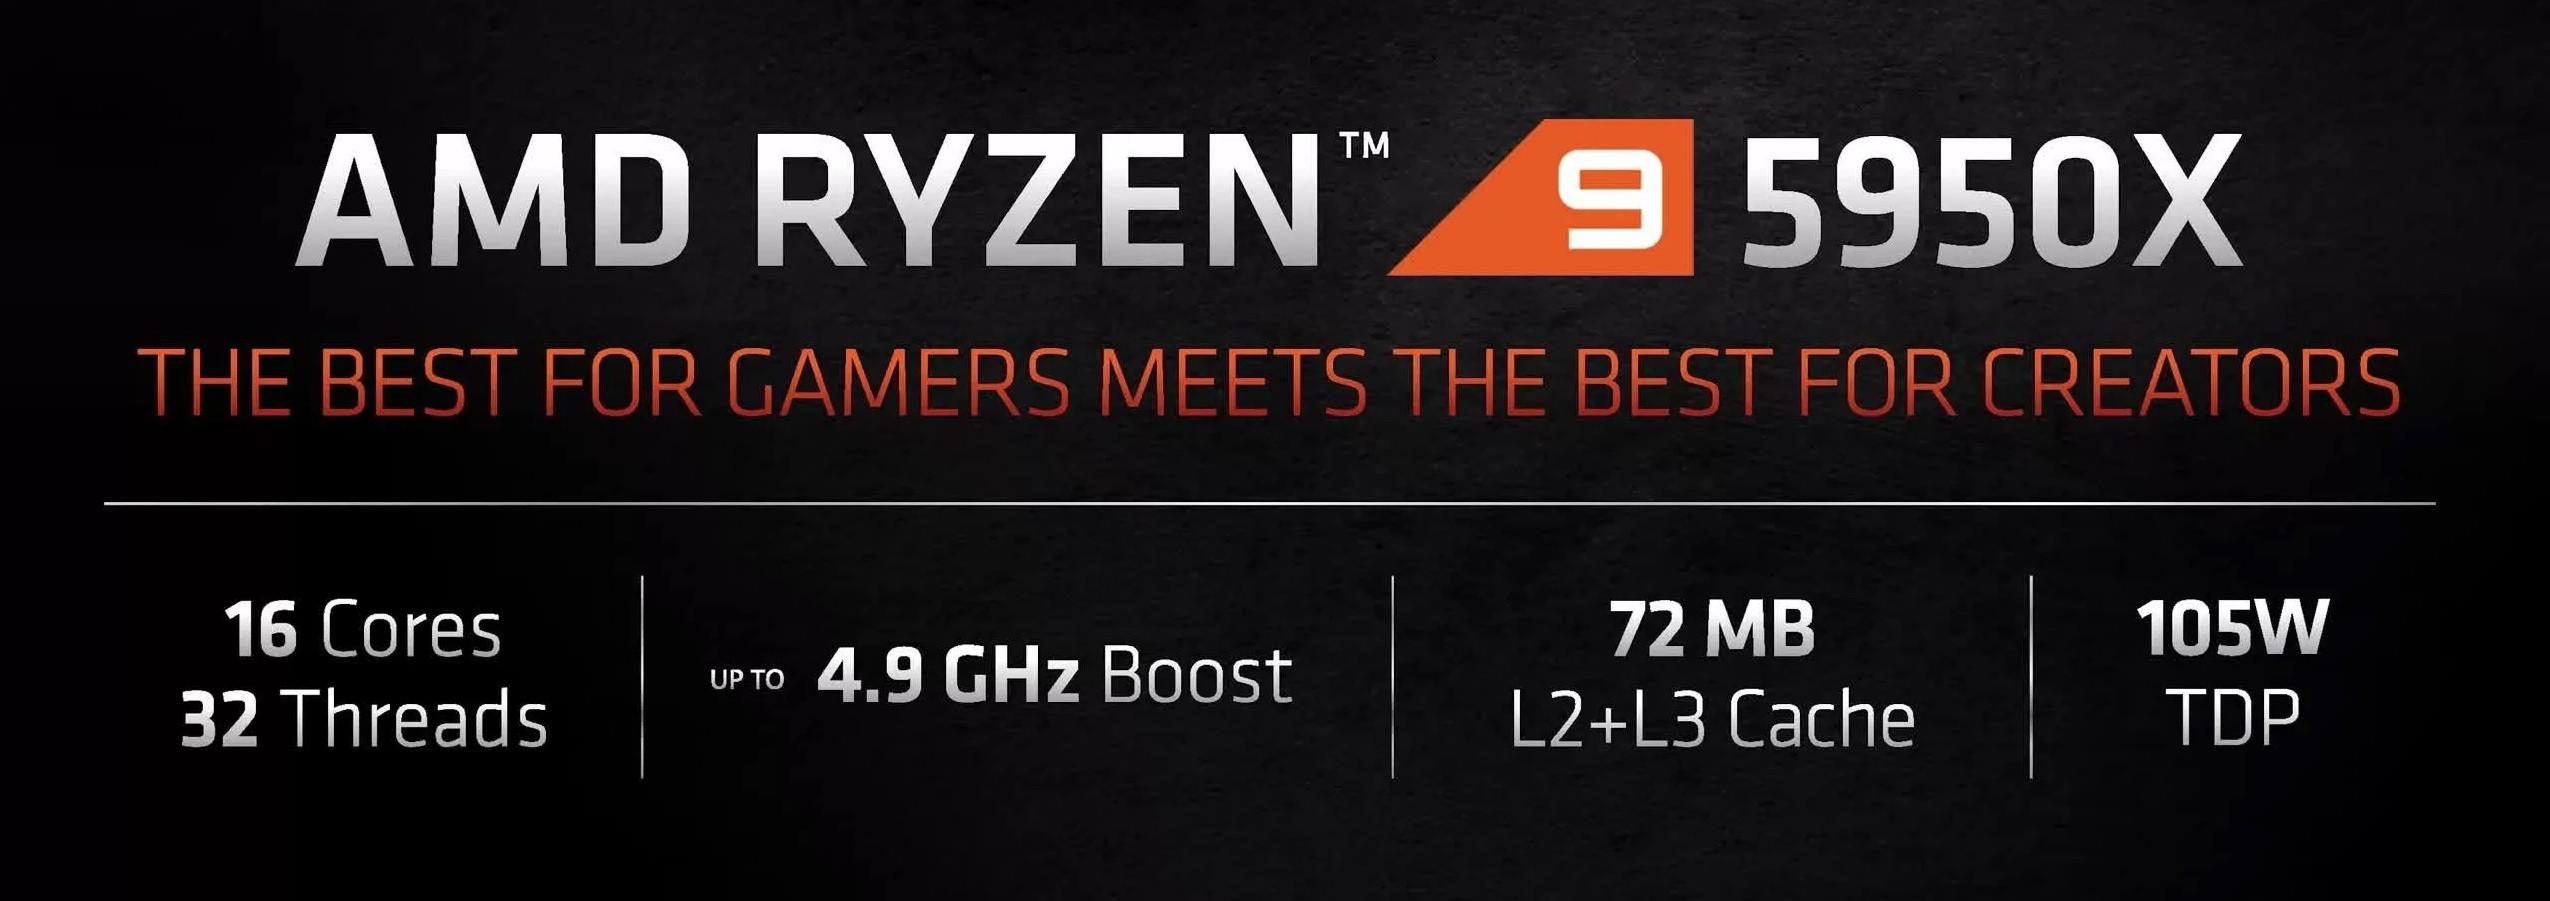 34976_CPU-AMD-Ryzen-9-5950X-Spec.jpg